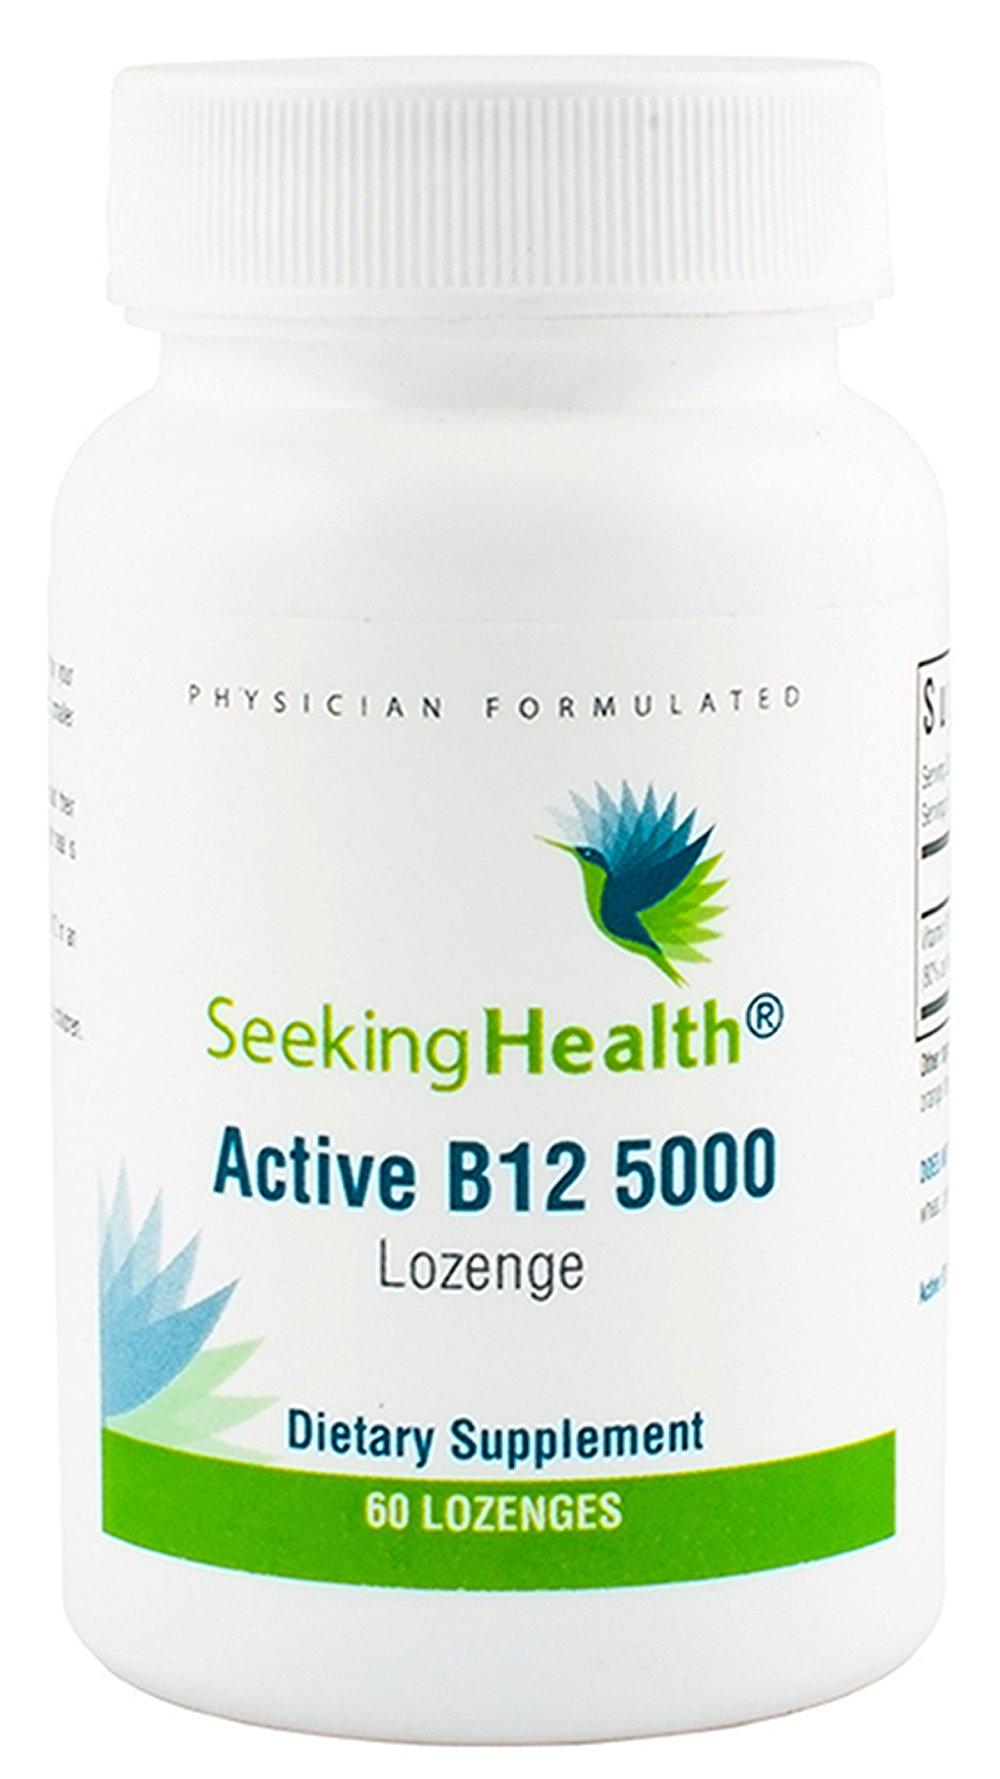 Seeking Health | Active B12 Vitamin Supplement | 5,000 mcg Lozenge | B Engergy Supplement